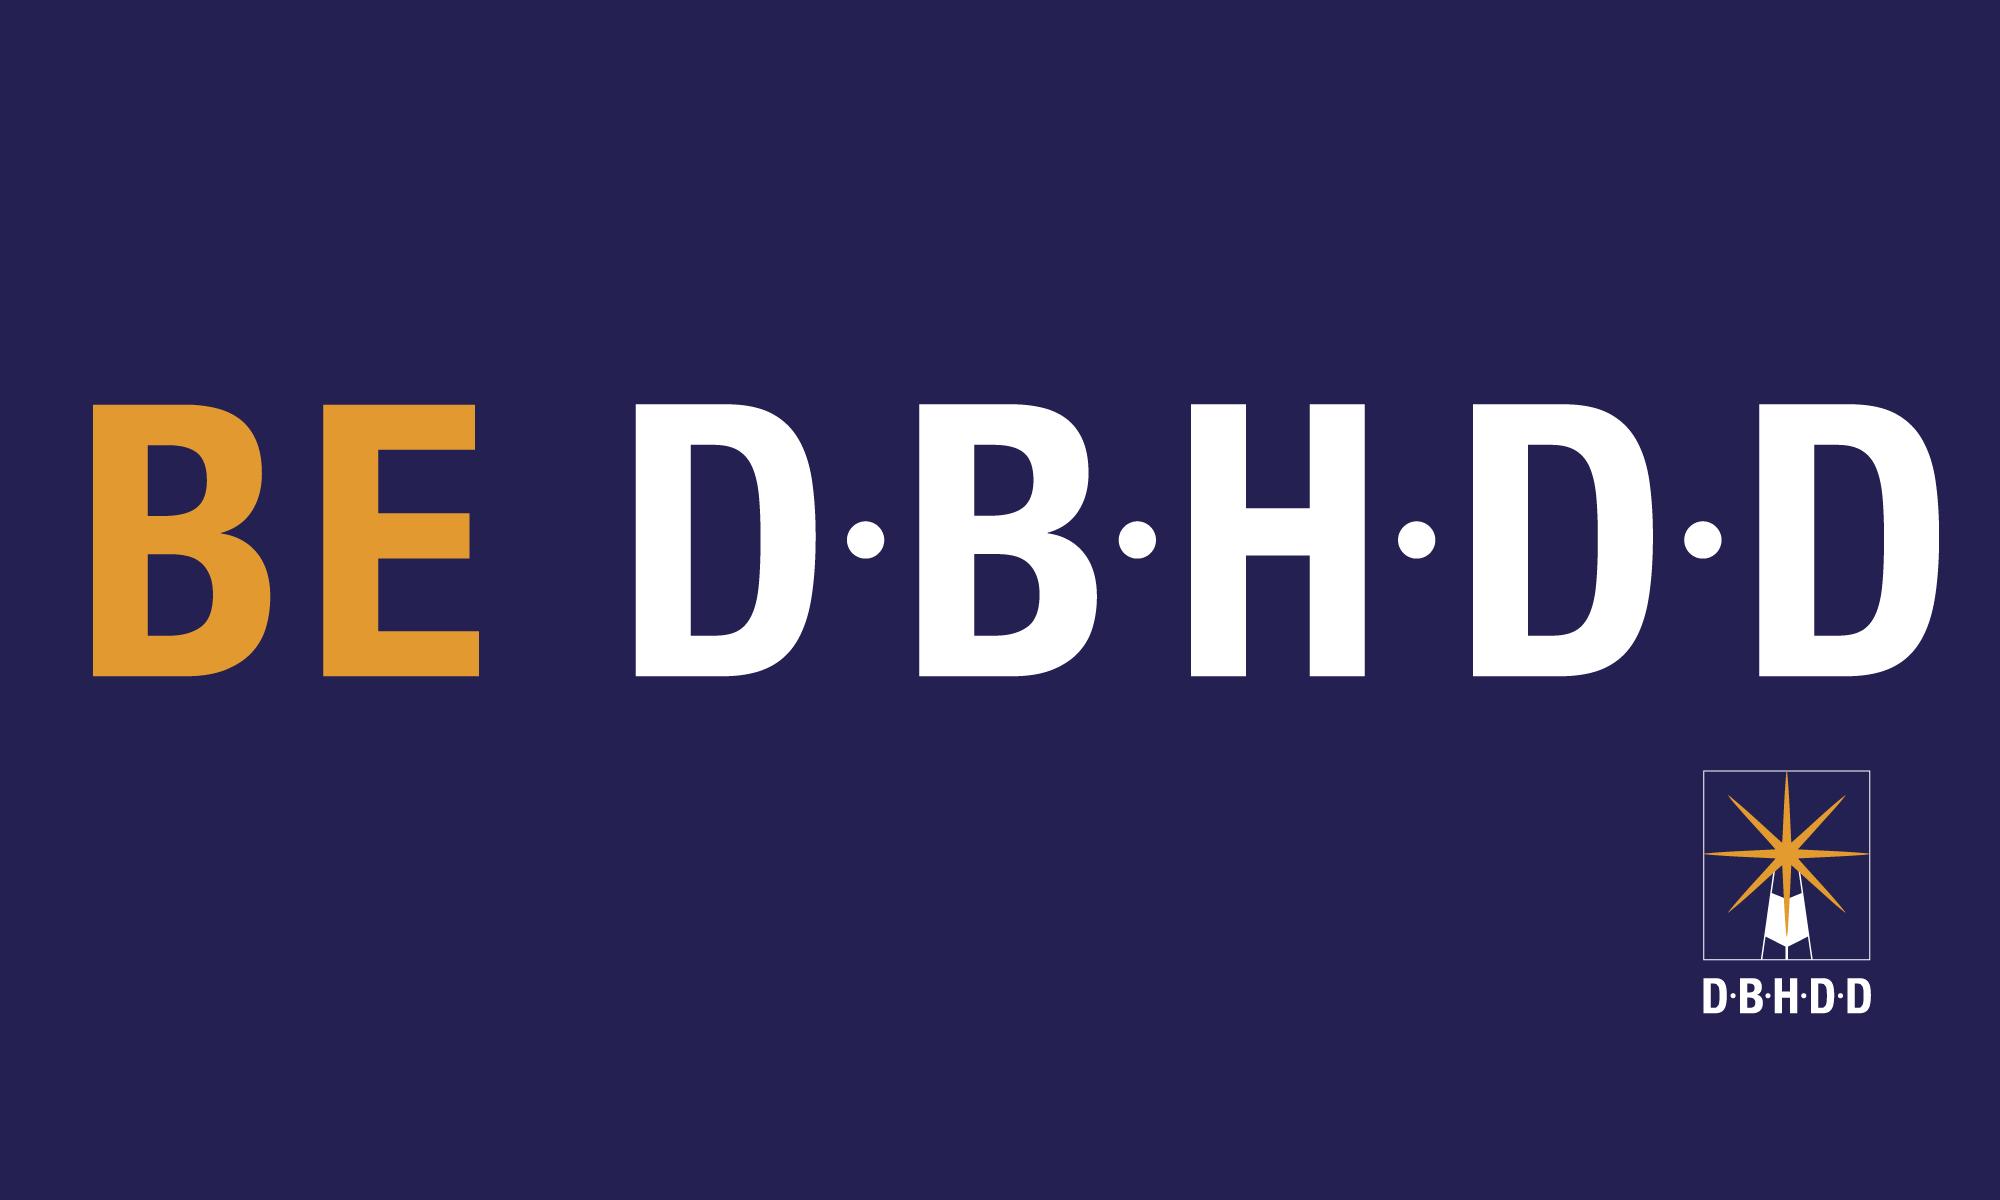 DBHDD Blog